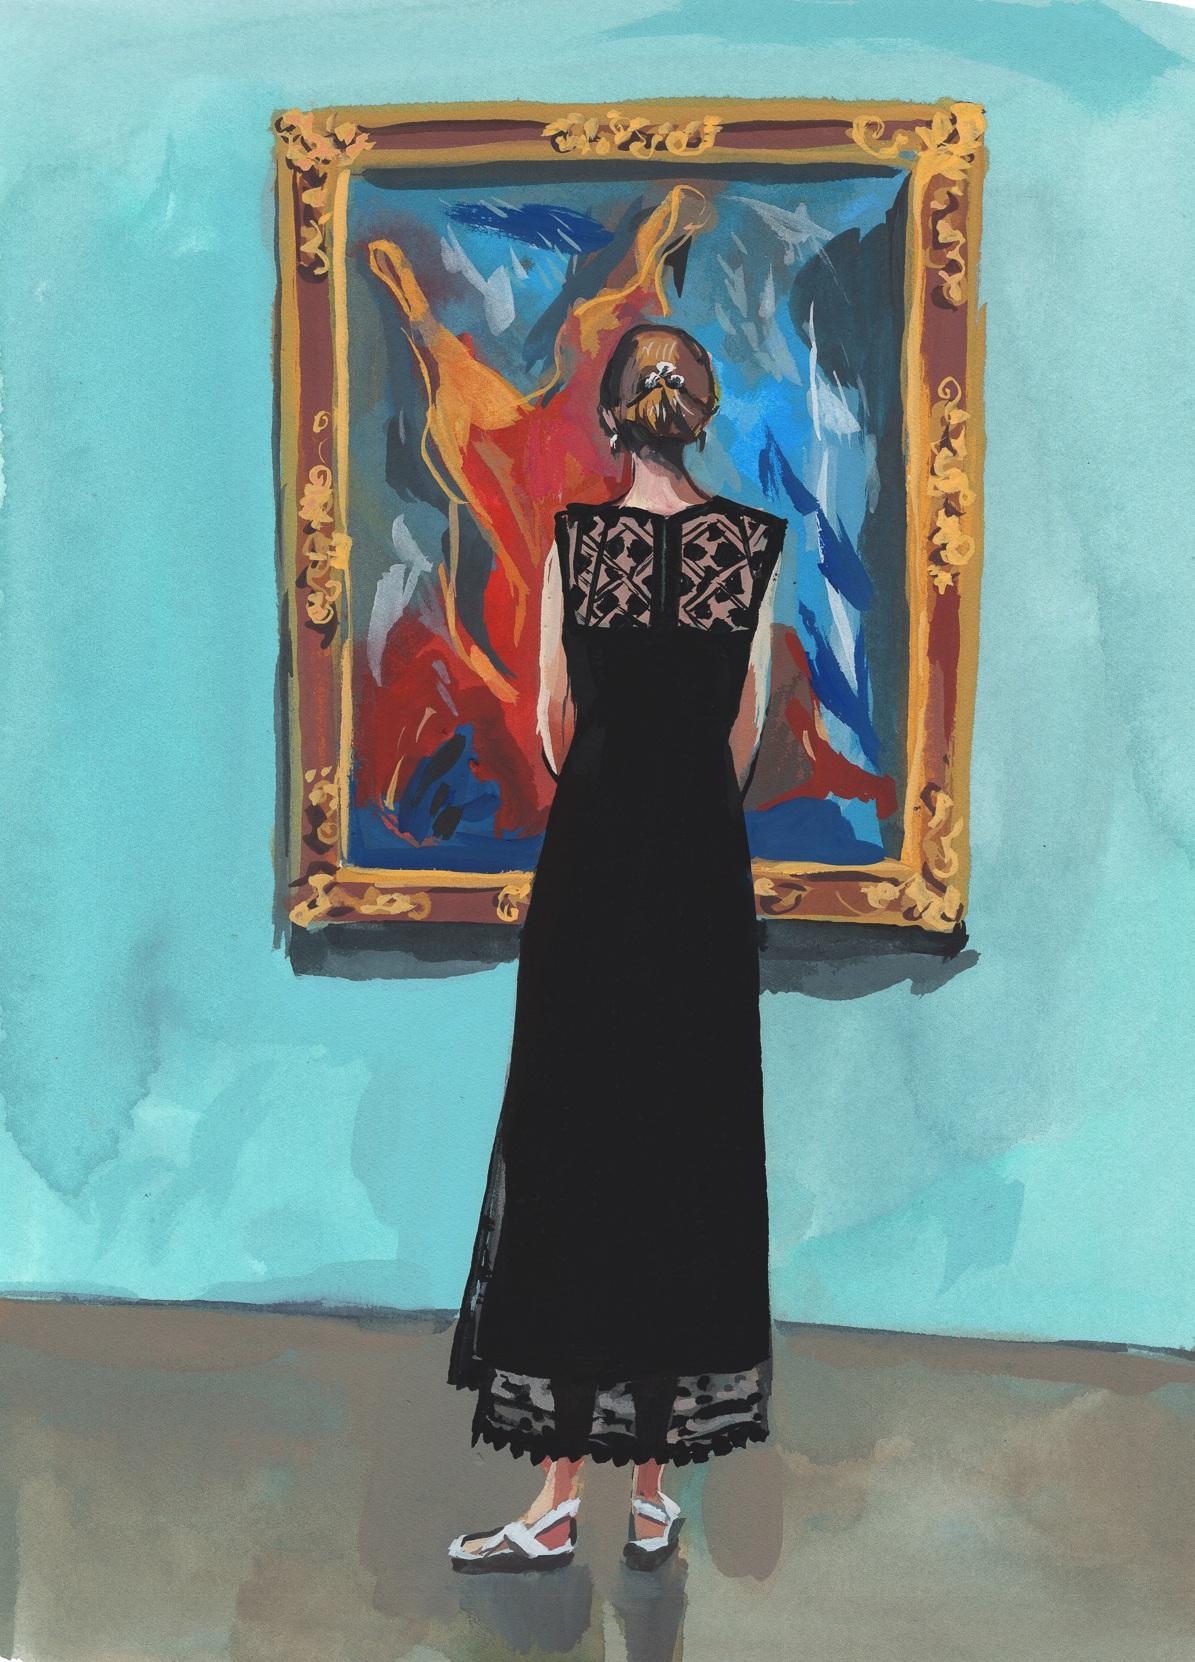 SOI 61 2018 - ARTIST: Jenny KroikTITLE: Soutine [Series, 5 of 6]